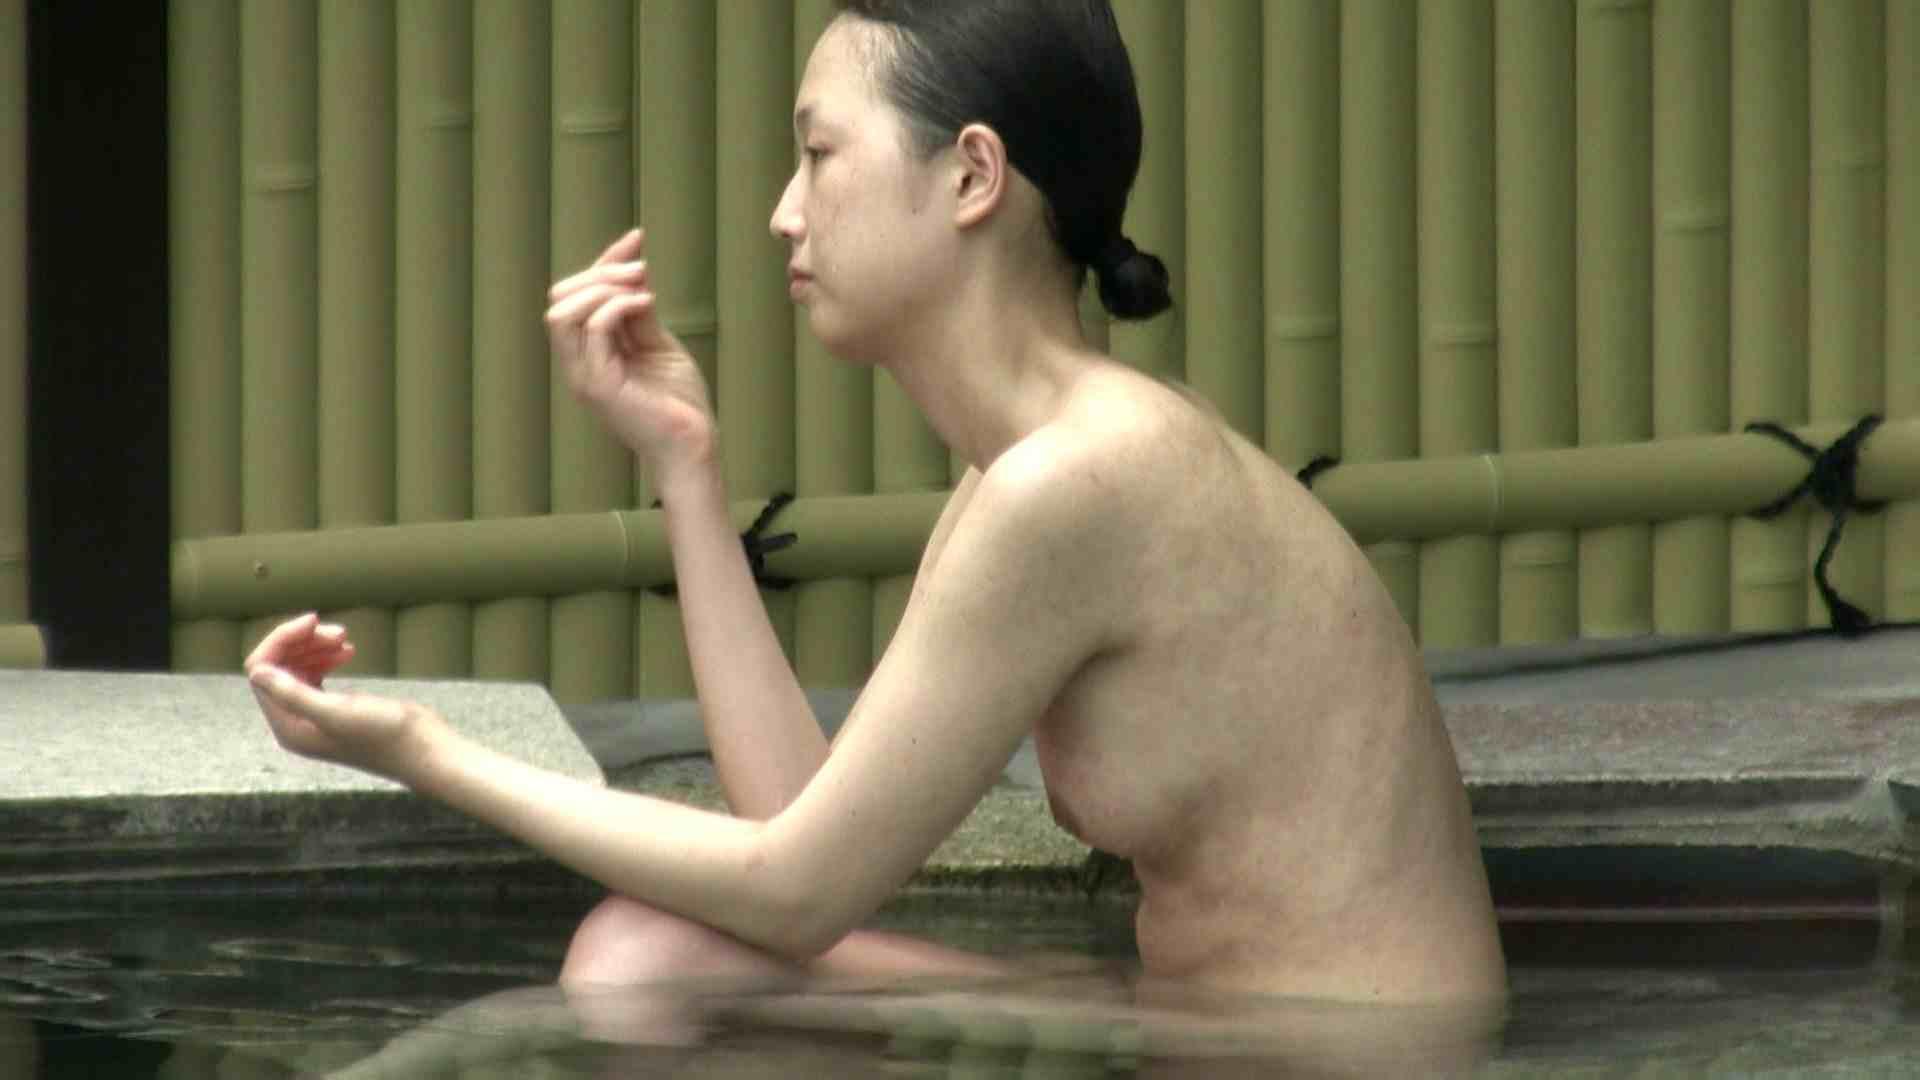 Aquaな露天風呂Vol.661 OLセックス | 露天  105画像 88